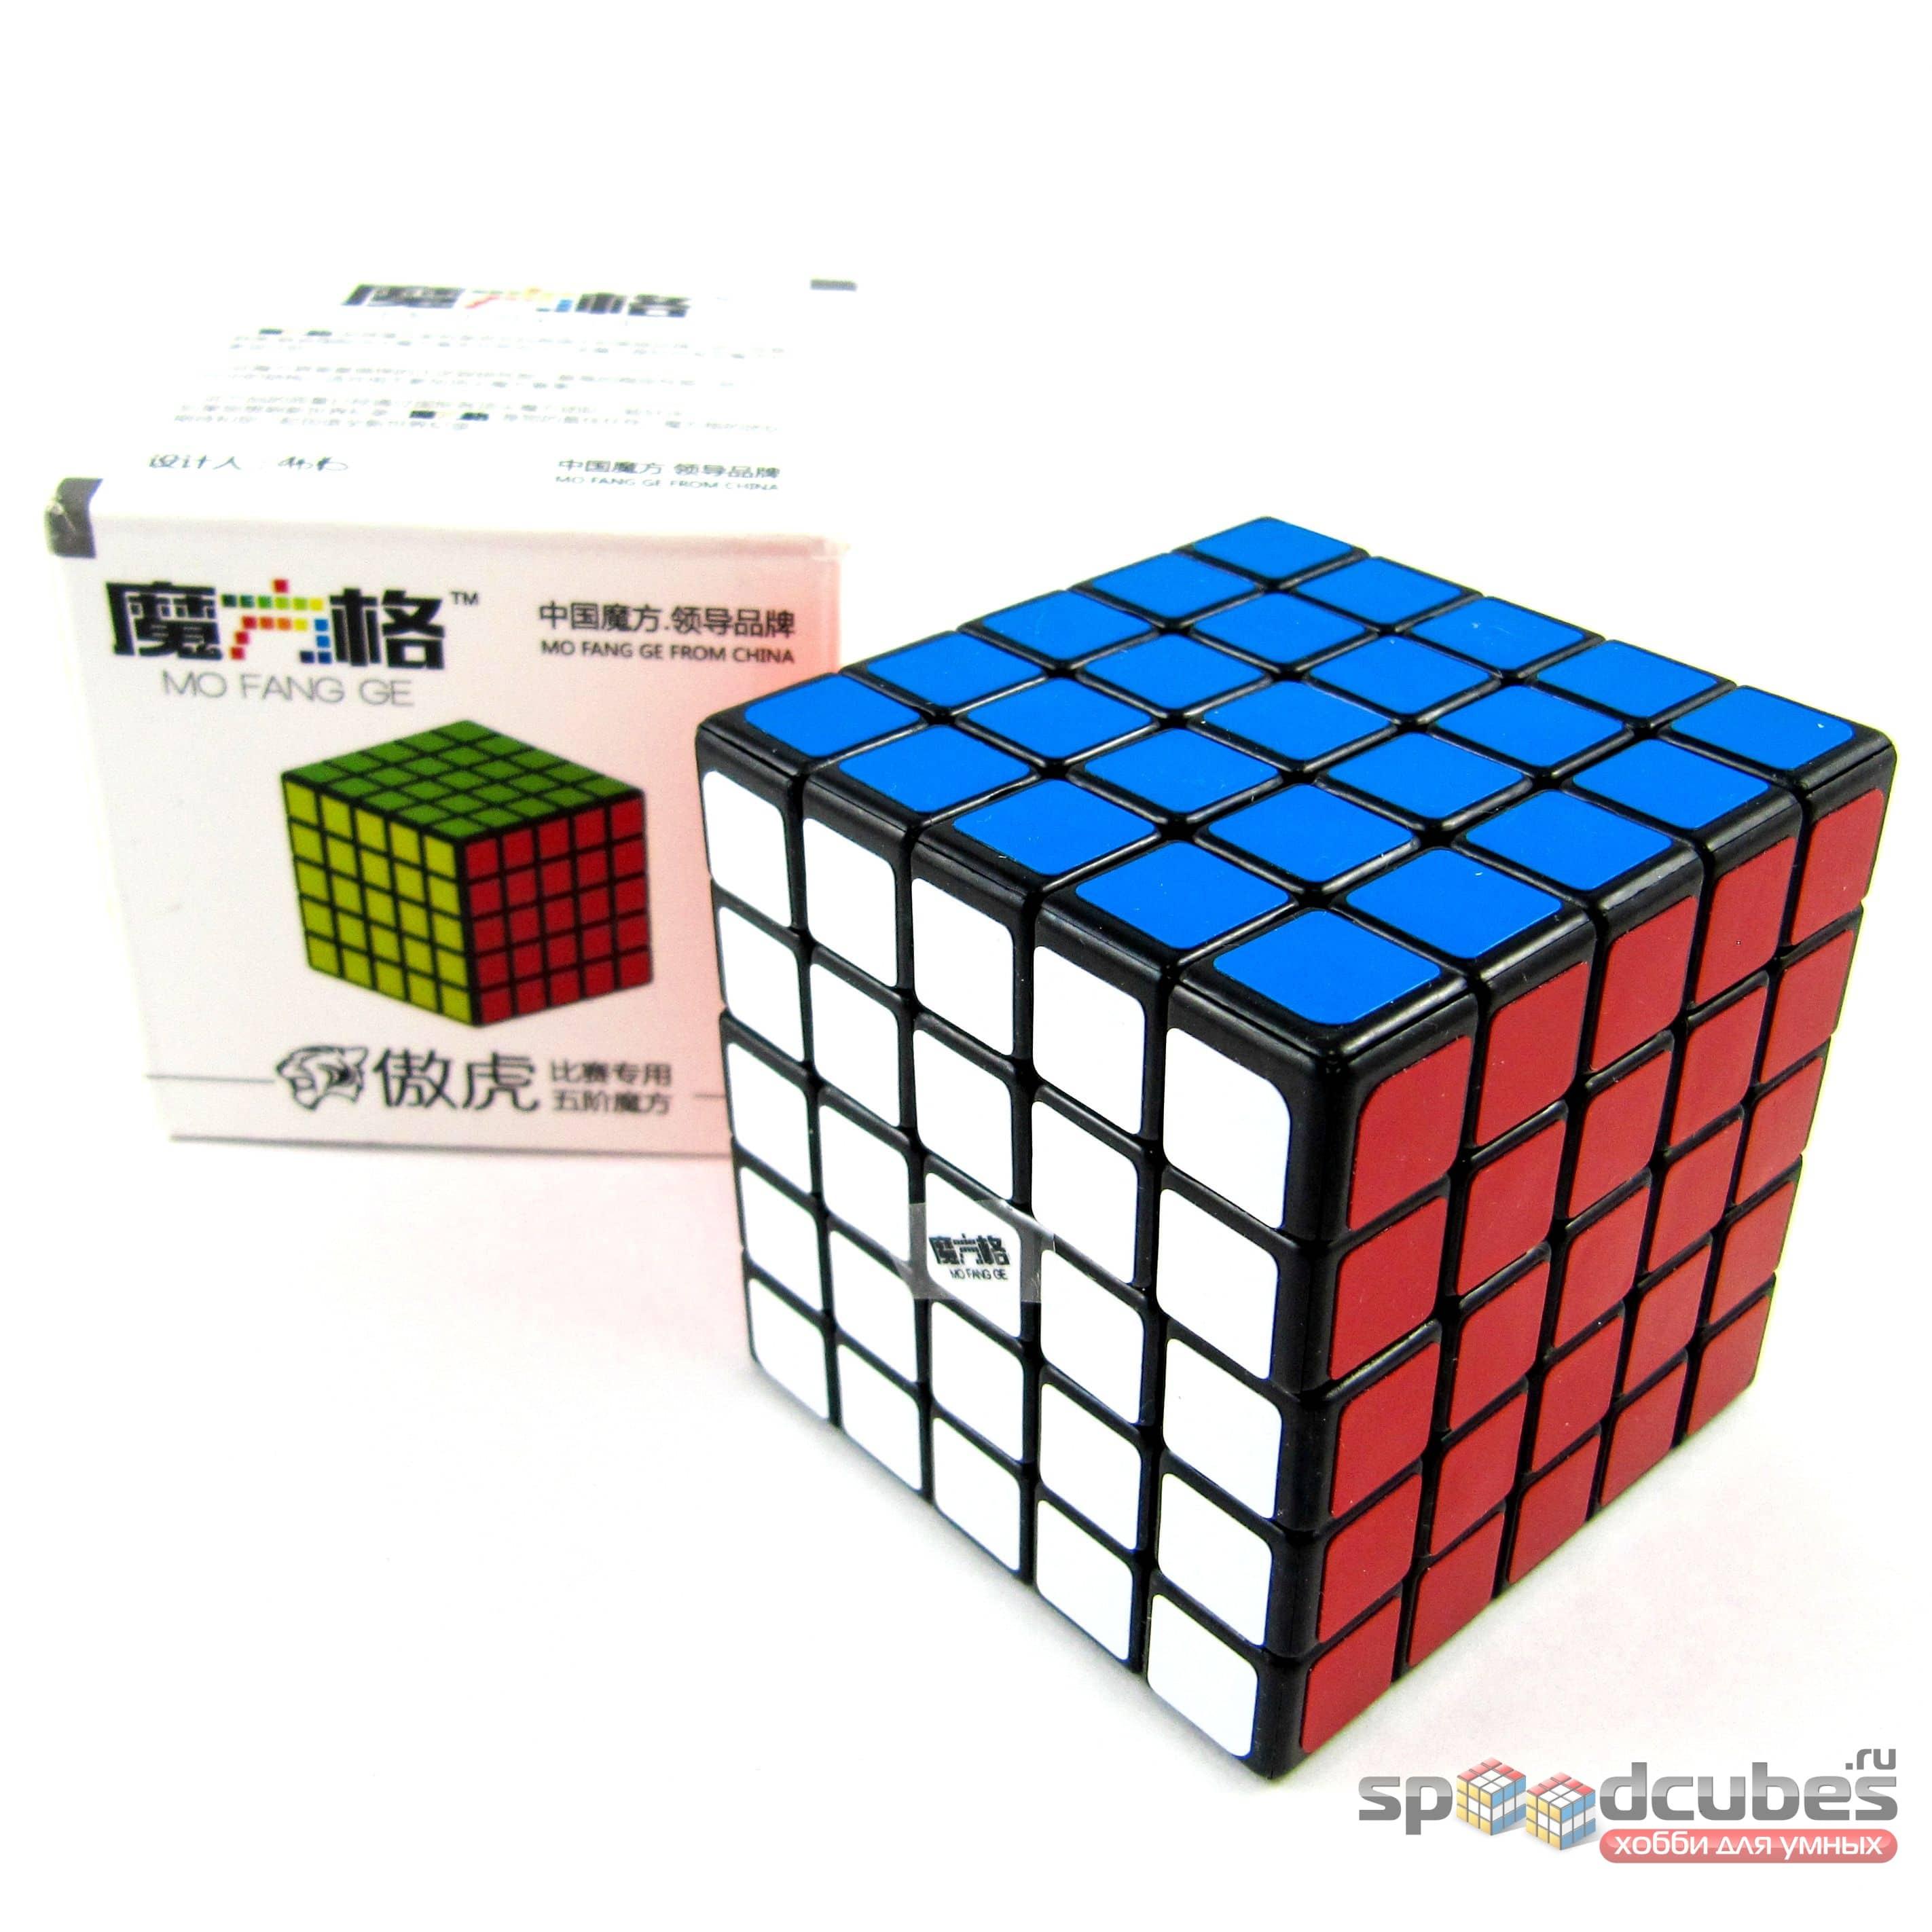 Qiyi 5×5 Aohu 2